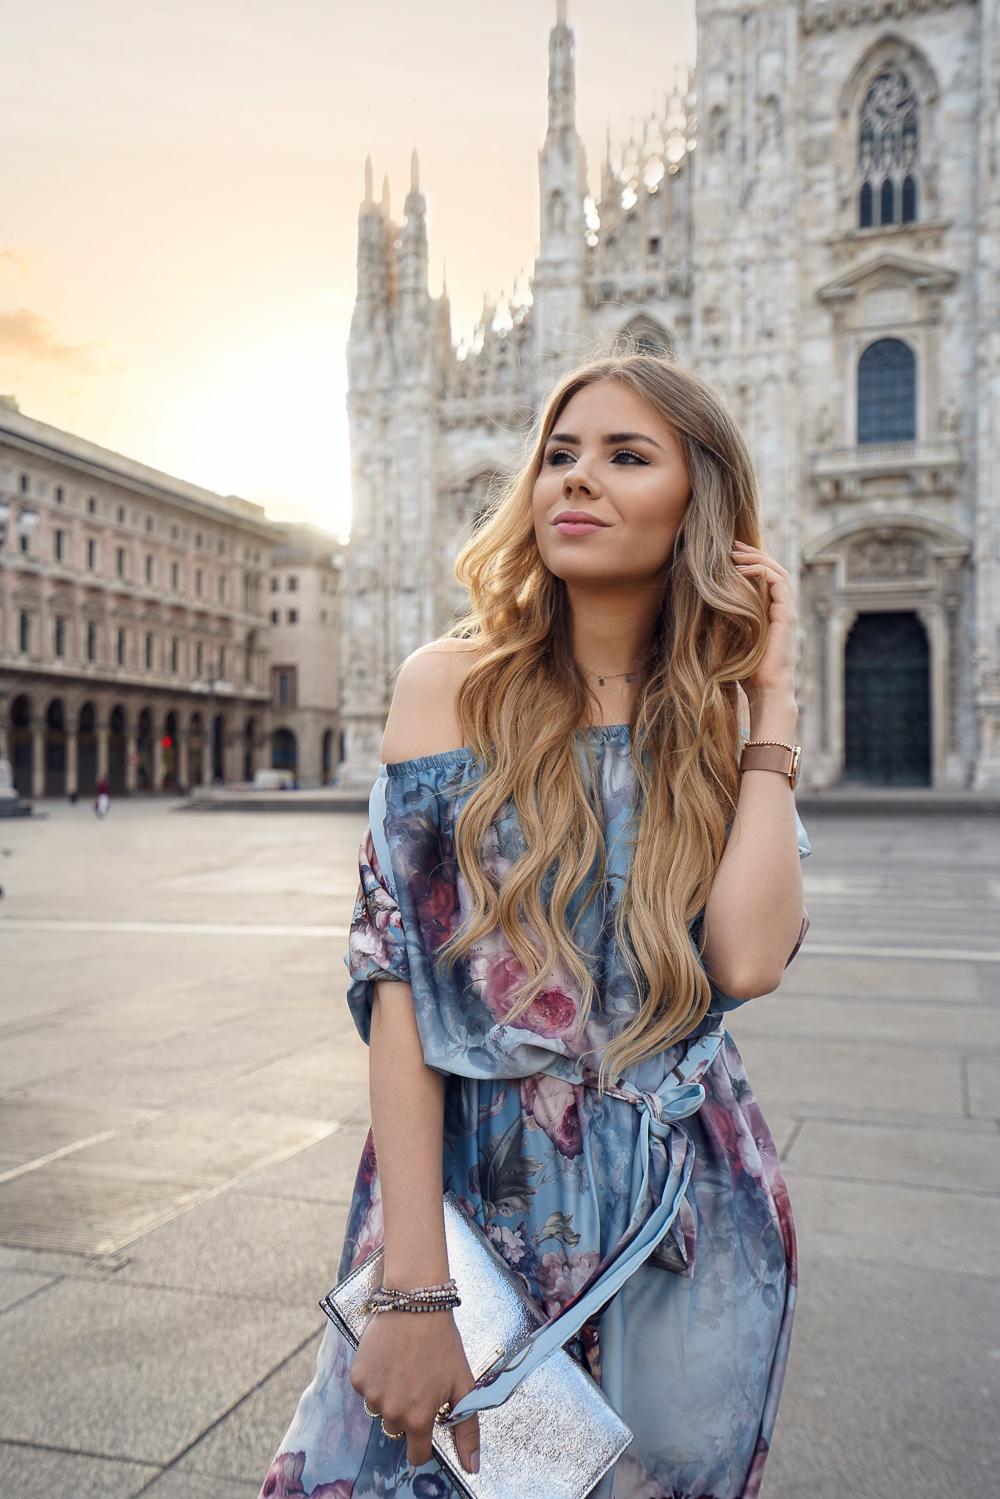 Fotospot Mailand Dom-blaues Off-Shoulder Kleid